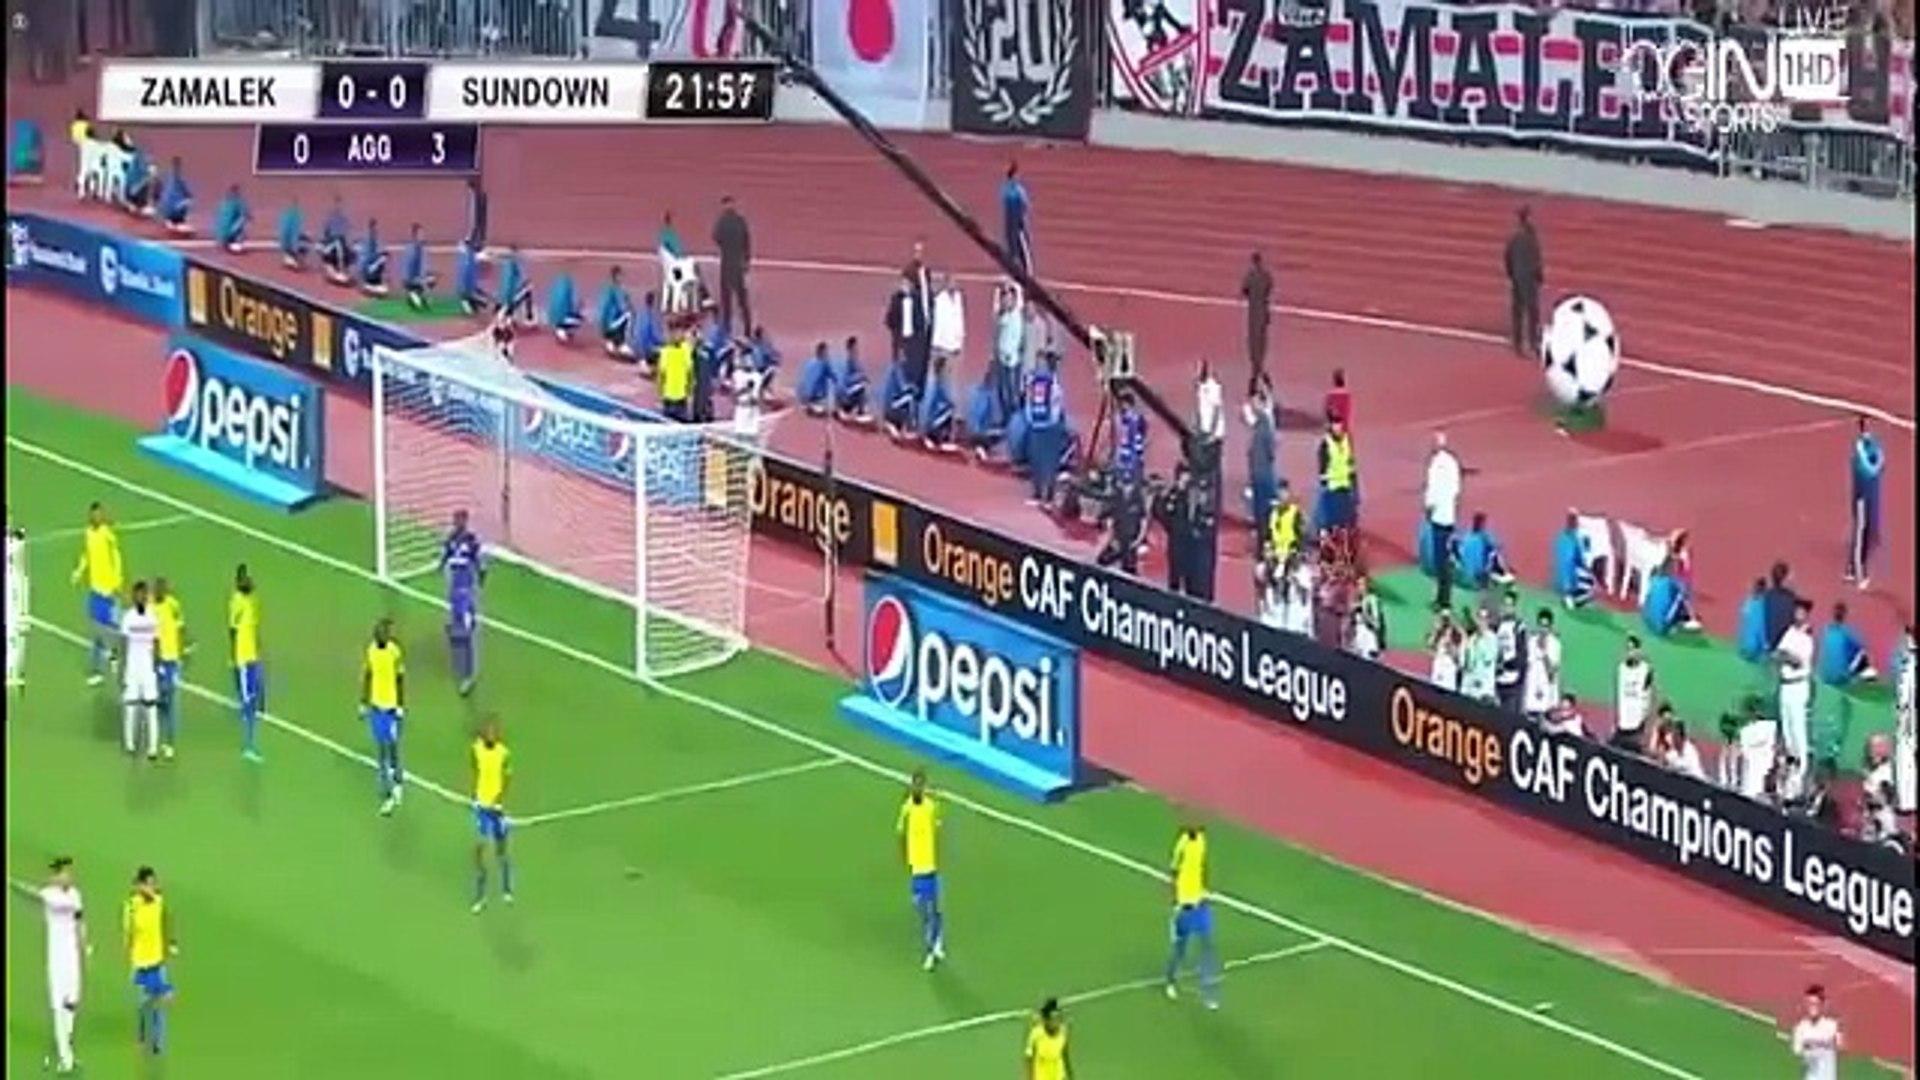 اهداف مباراة الزمالك وصن داونز 1 0 نهائي افريقيا فيديو Dailymotion